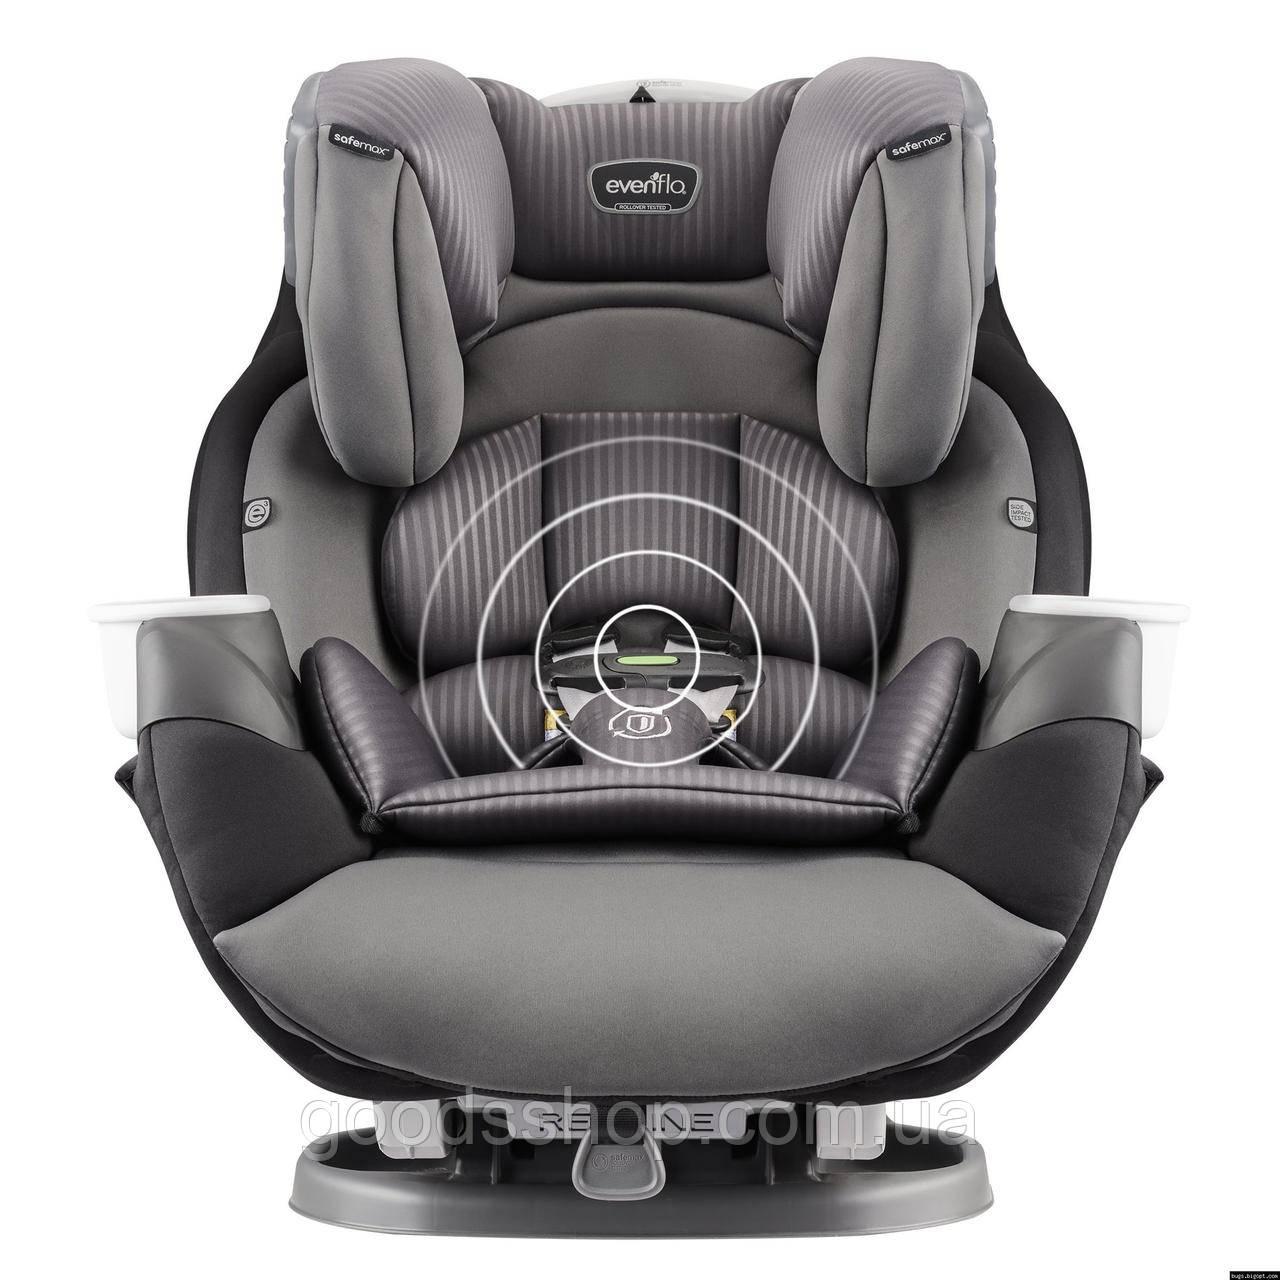 Evenflo® автокресло SafeMax Platinum - Industrial Edge (группа від 2,2 до 49,8 кг)